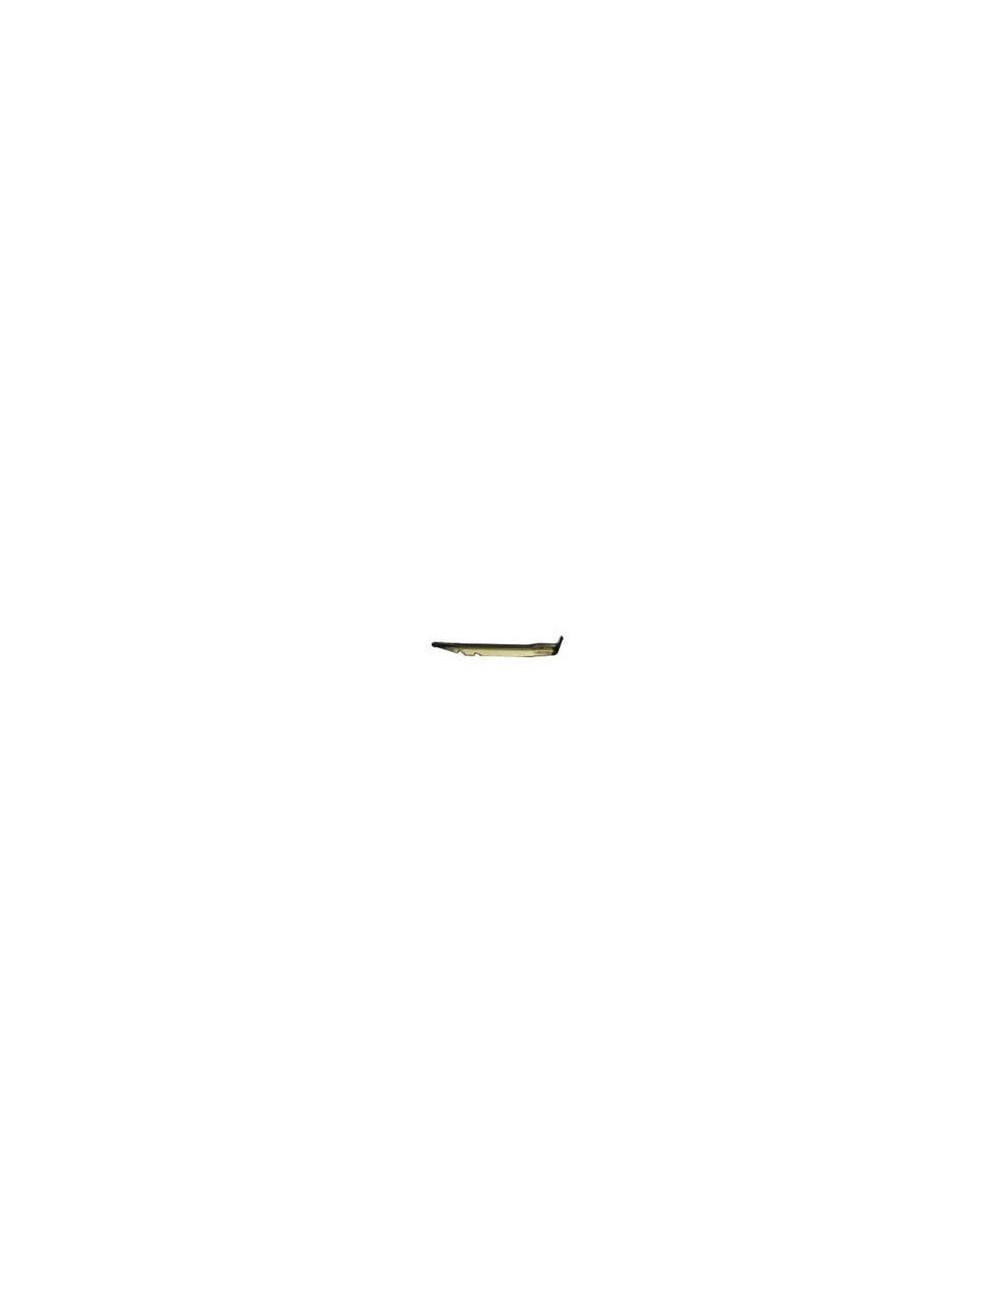 Picchetti a nastro cm.17 - BEAVER BRAND